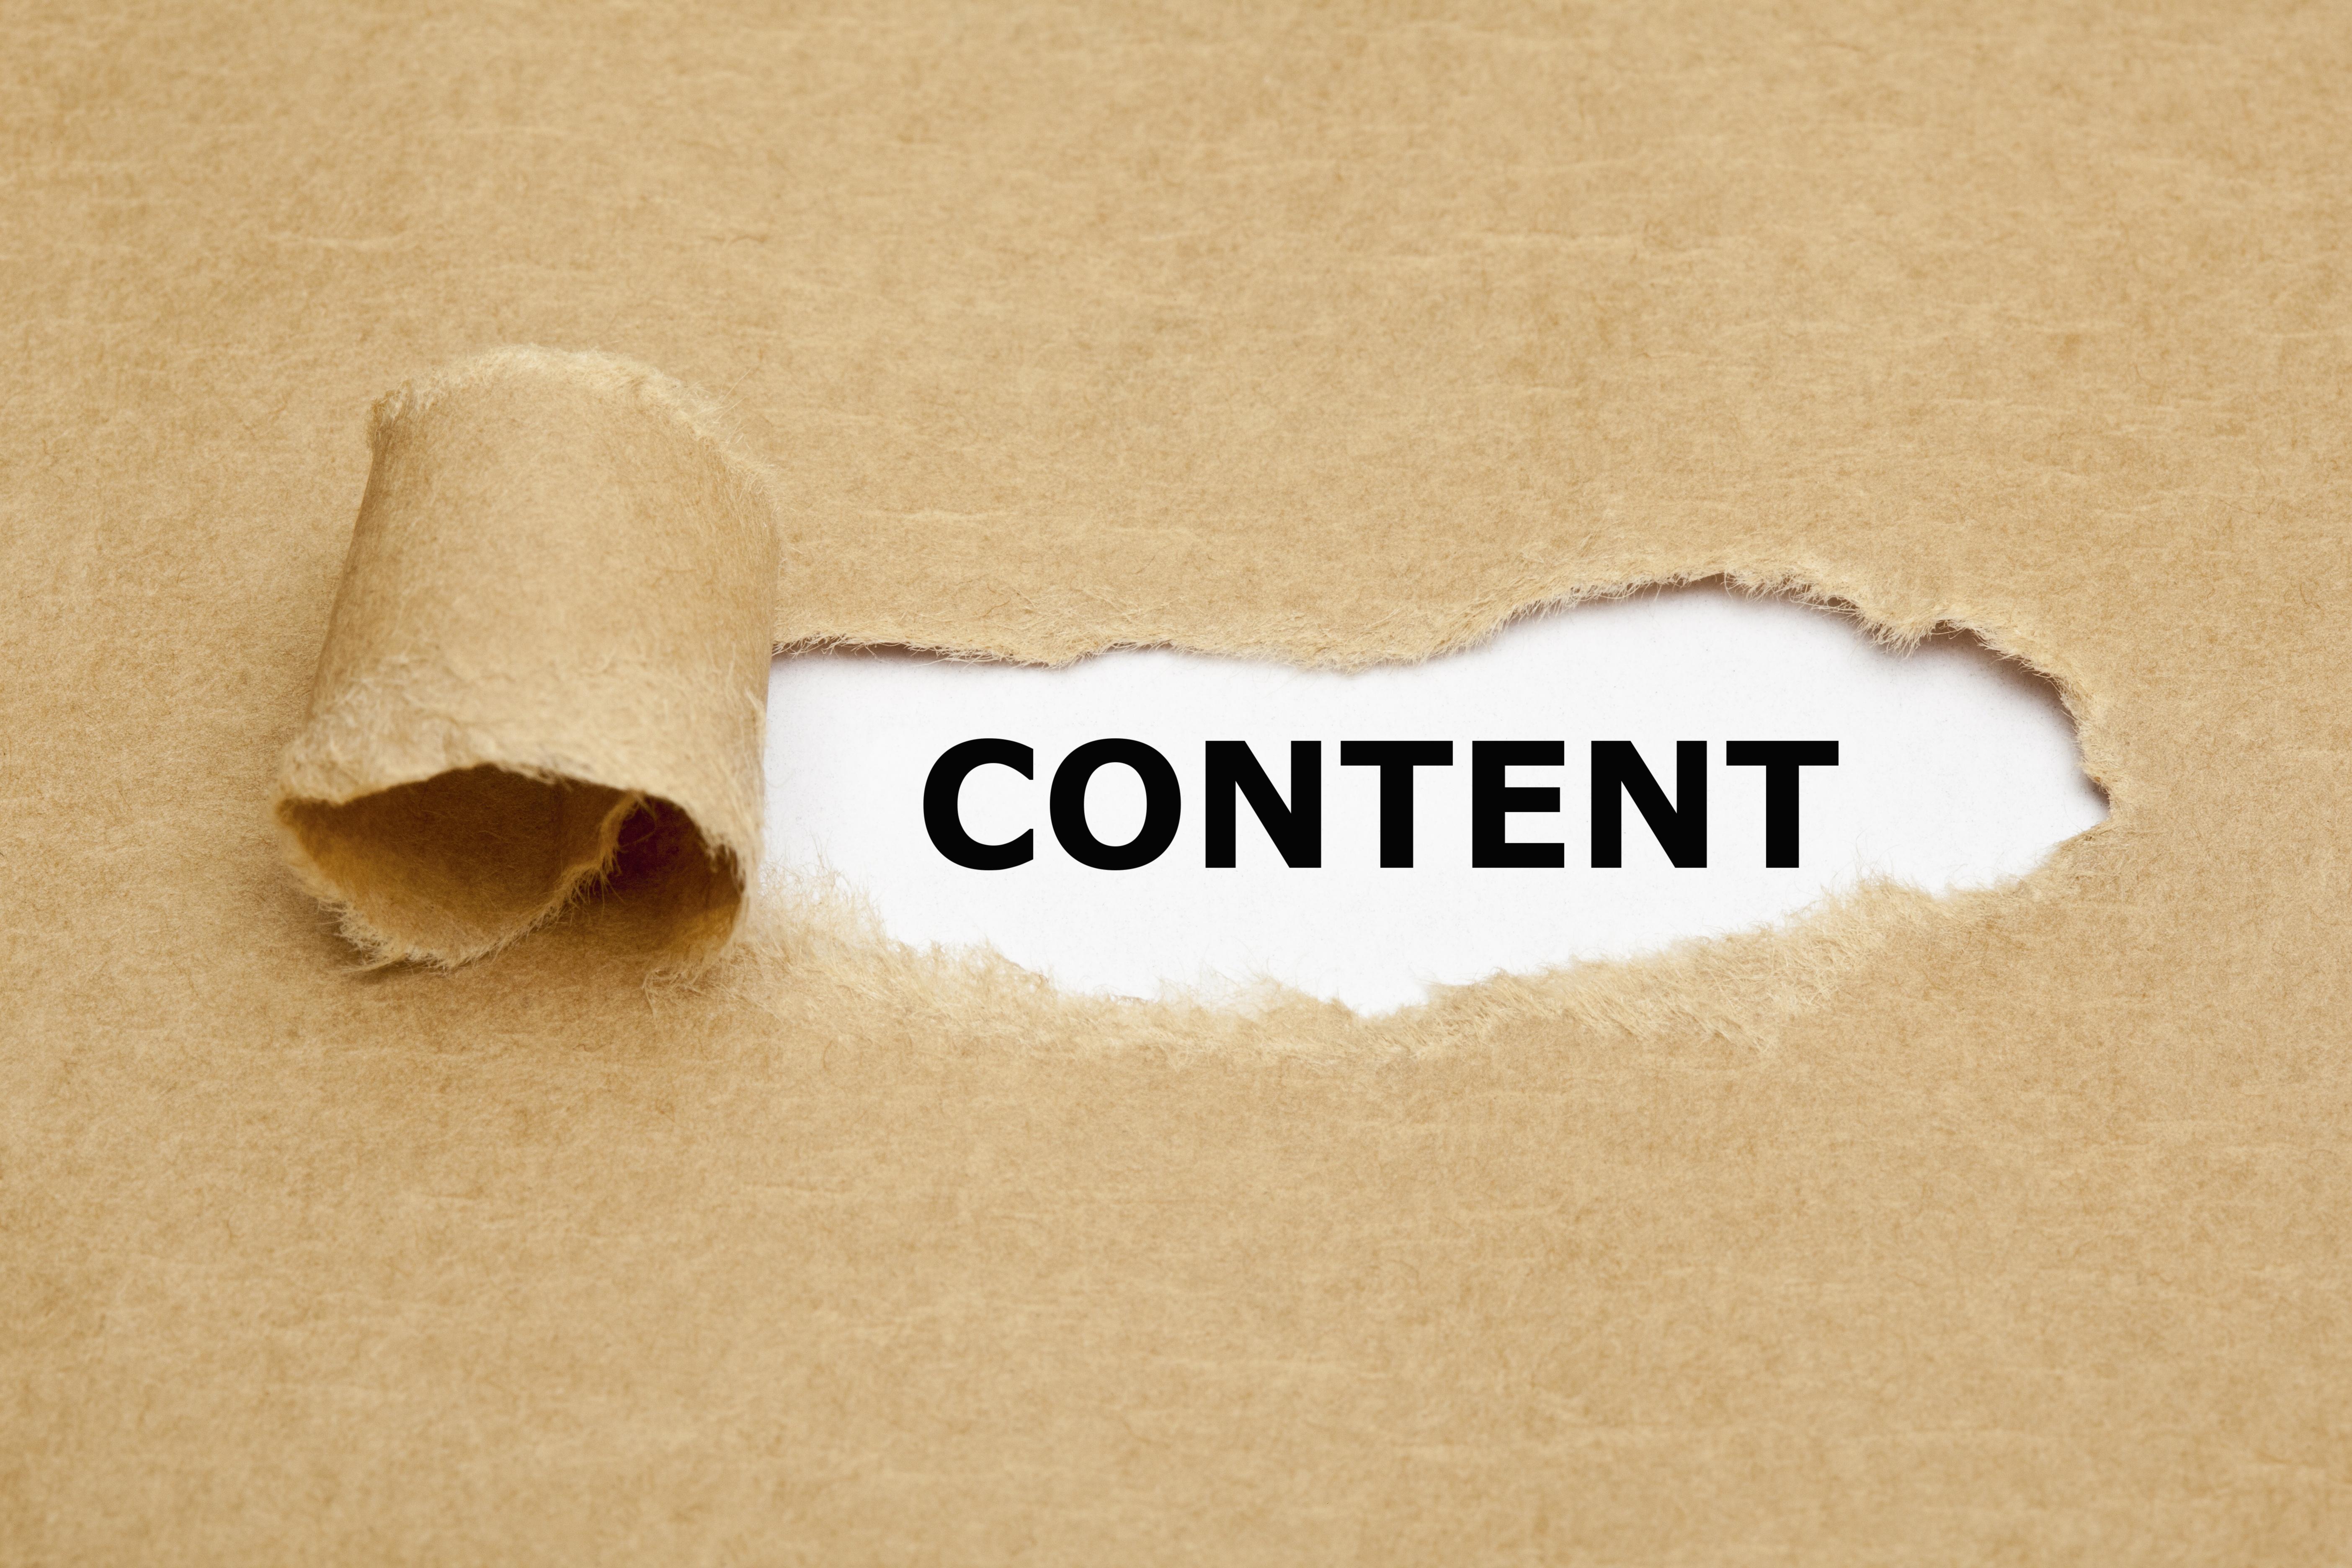 Proposez_un_contenu_remarquable.jpg